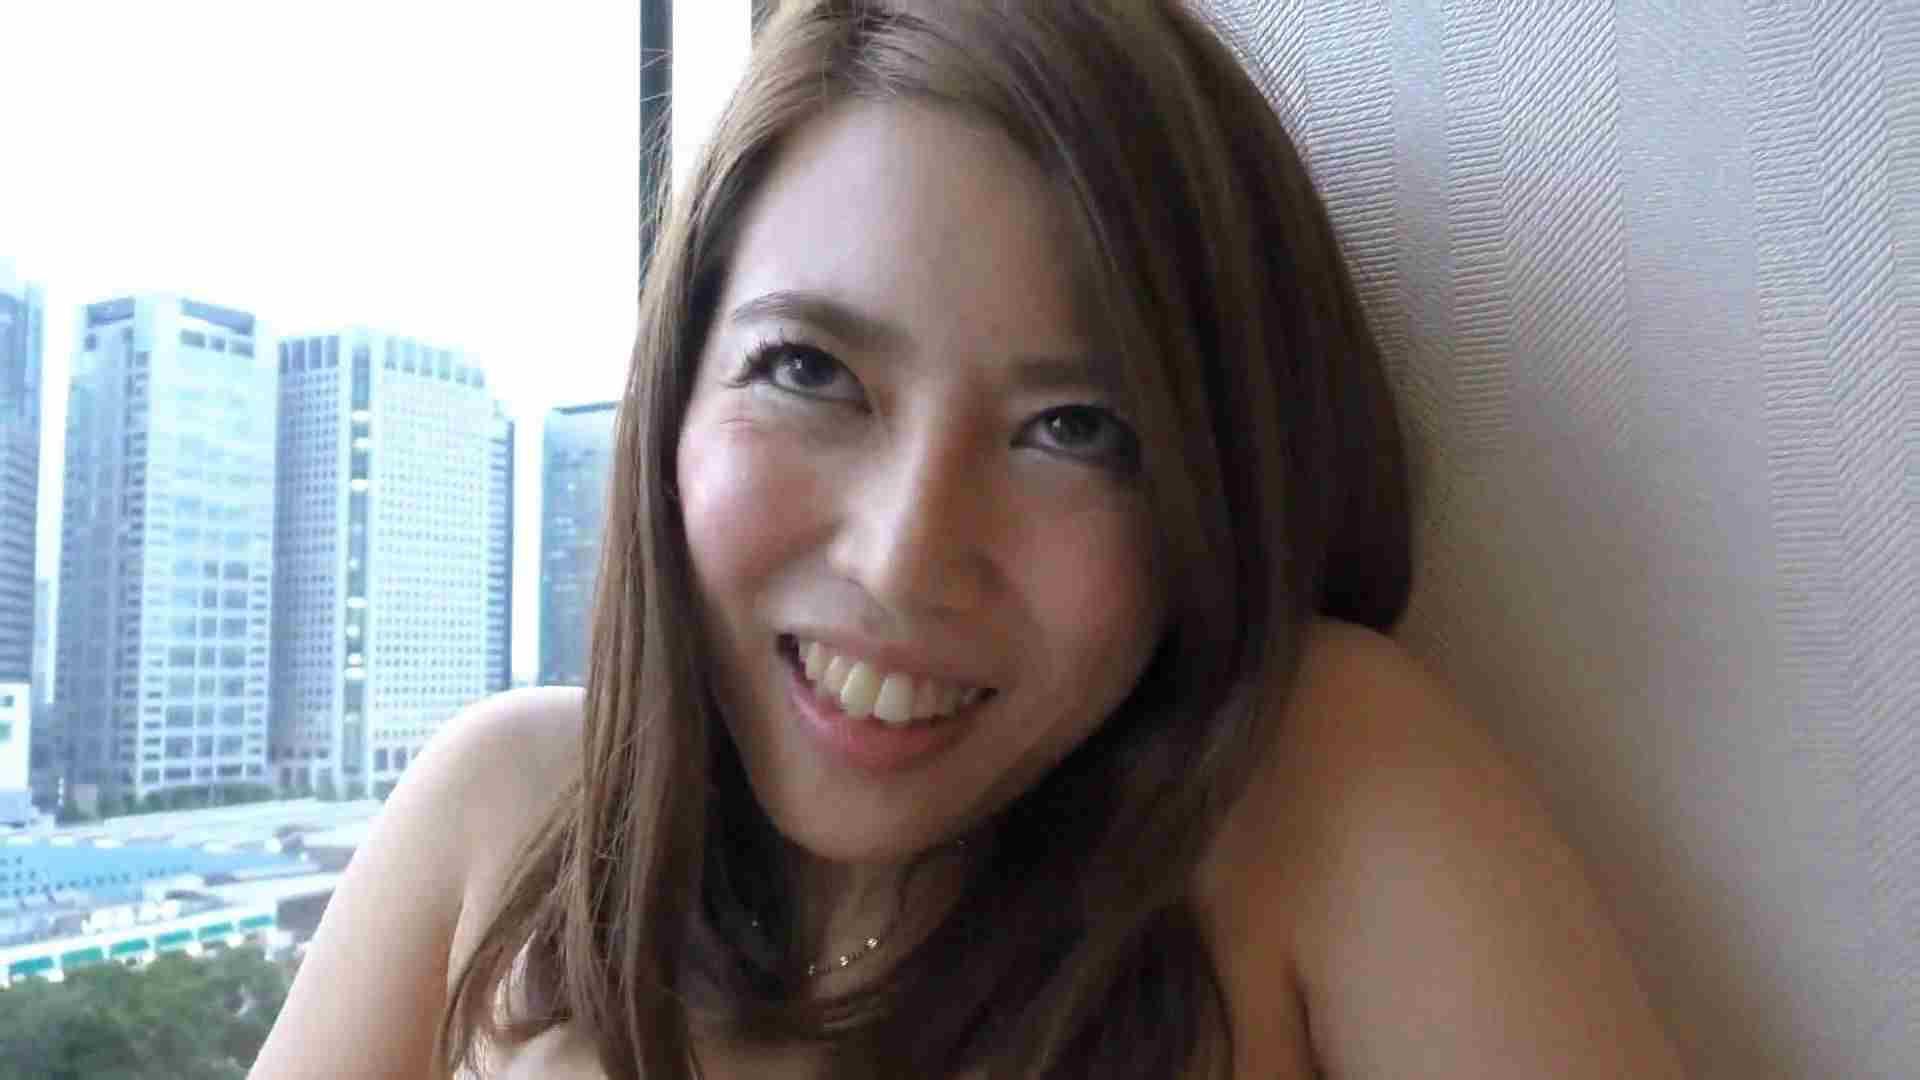 S級厳選美女ビッチガールVol.21 美女OL  101連発 24